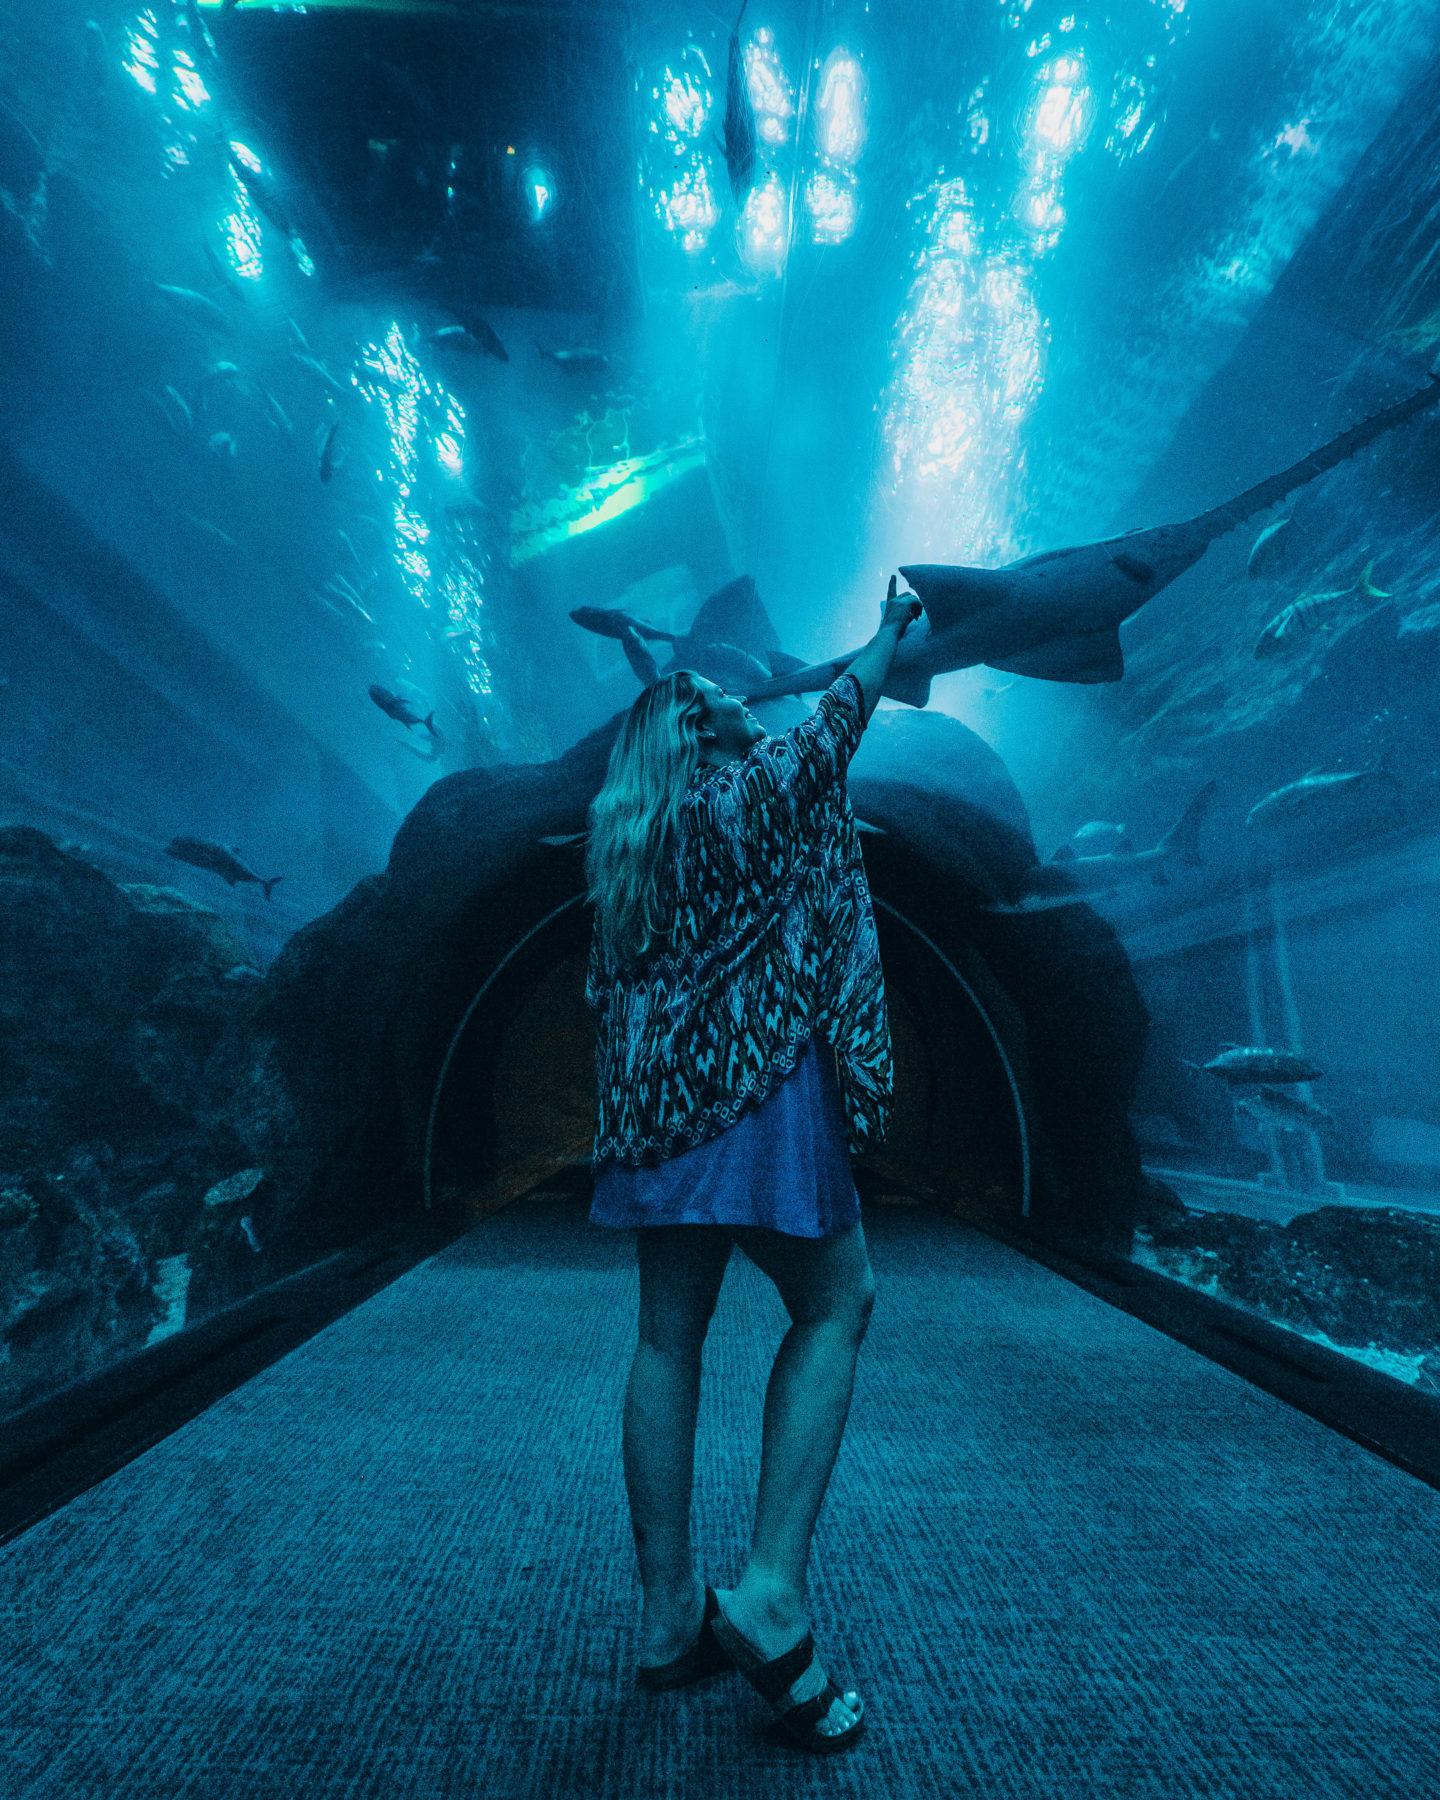 Dubai Aquarium walk-through tunnel